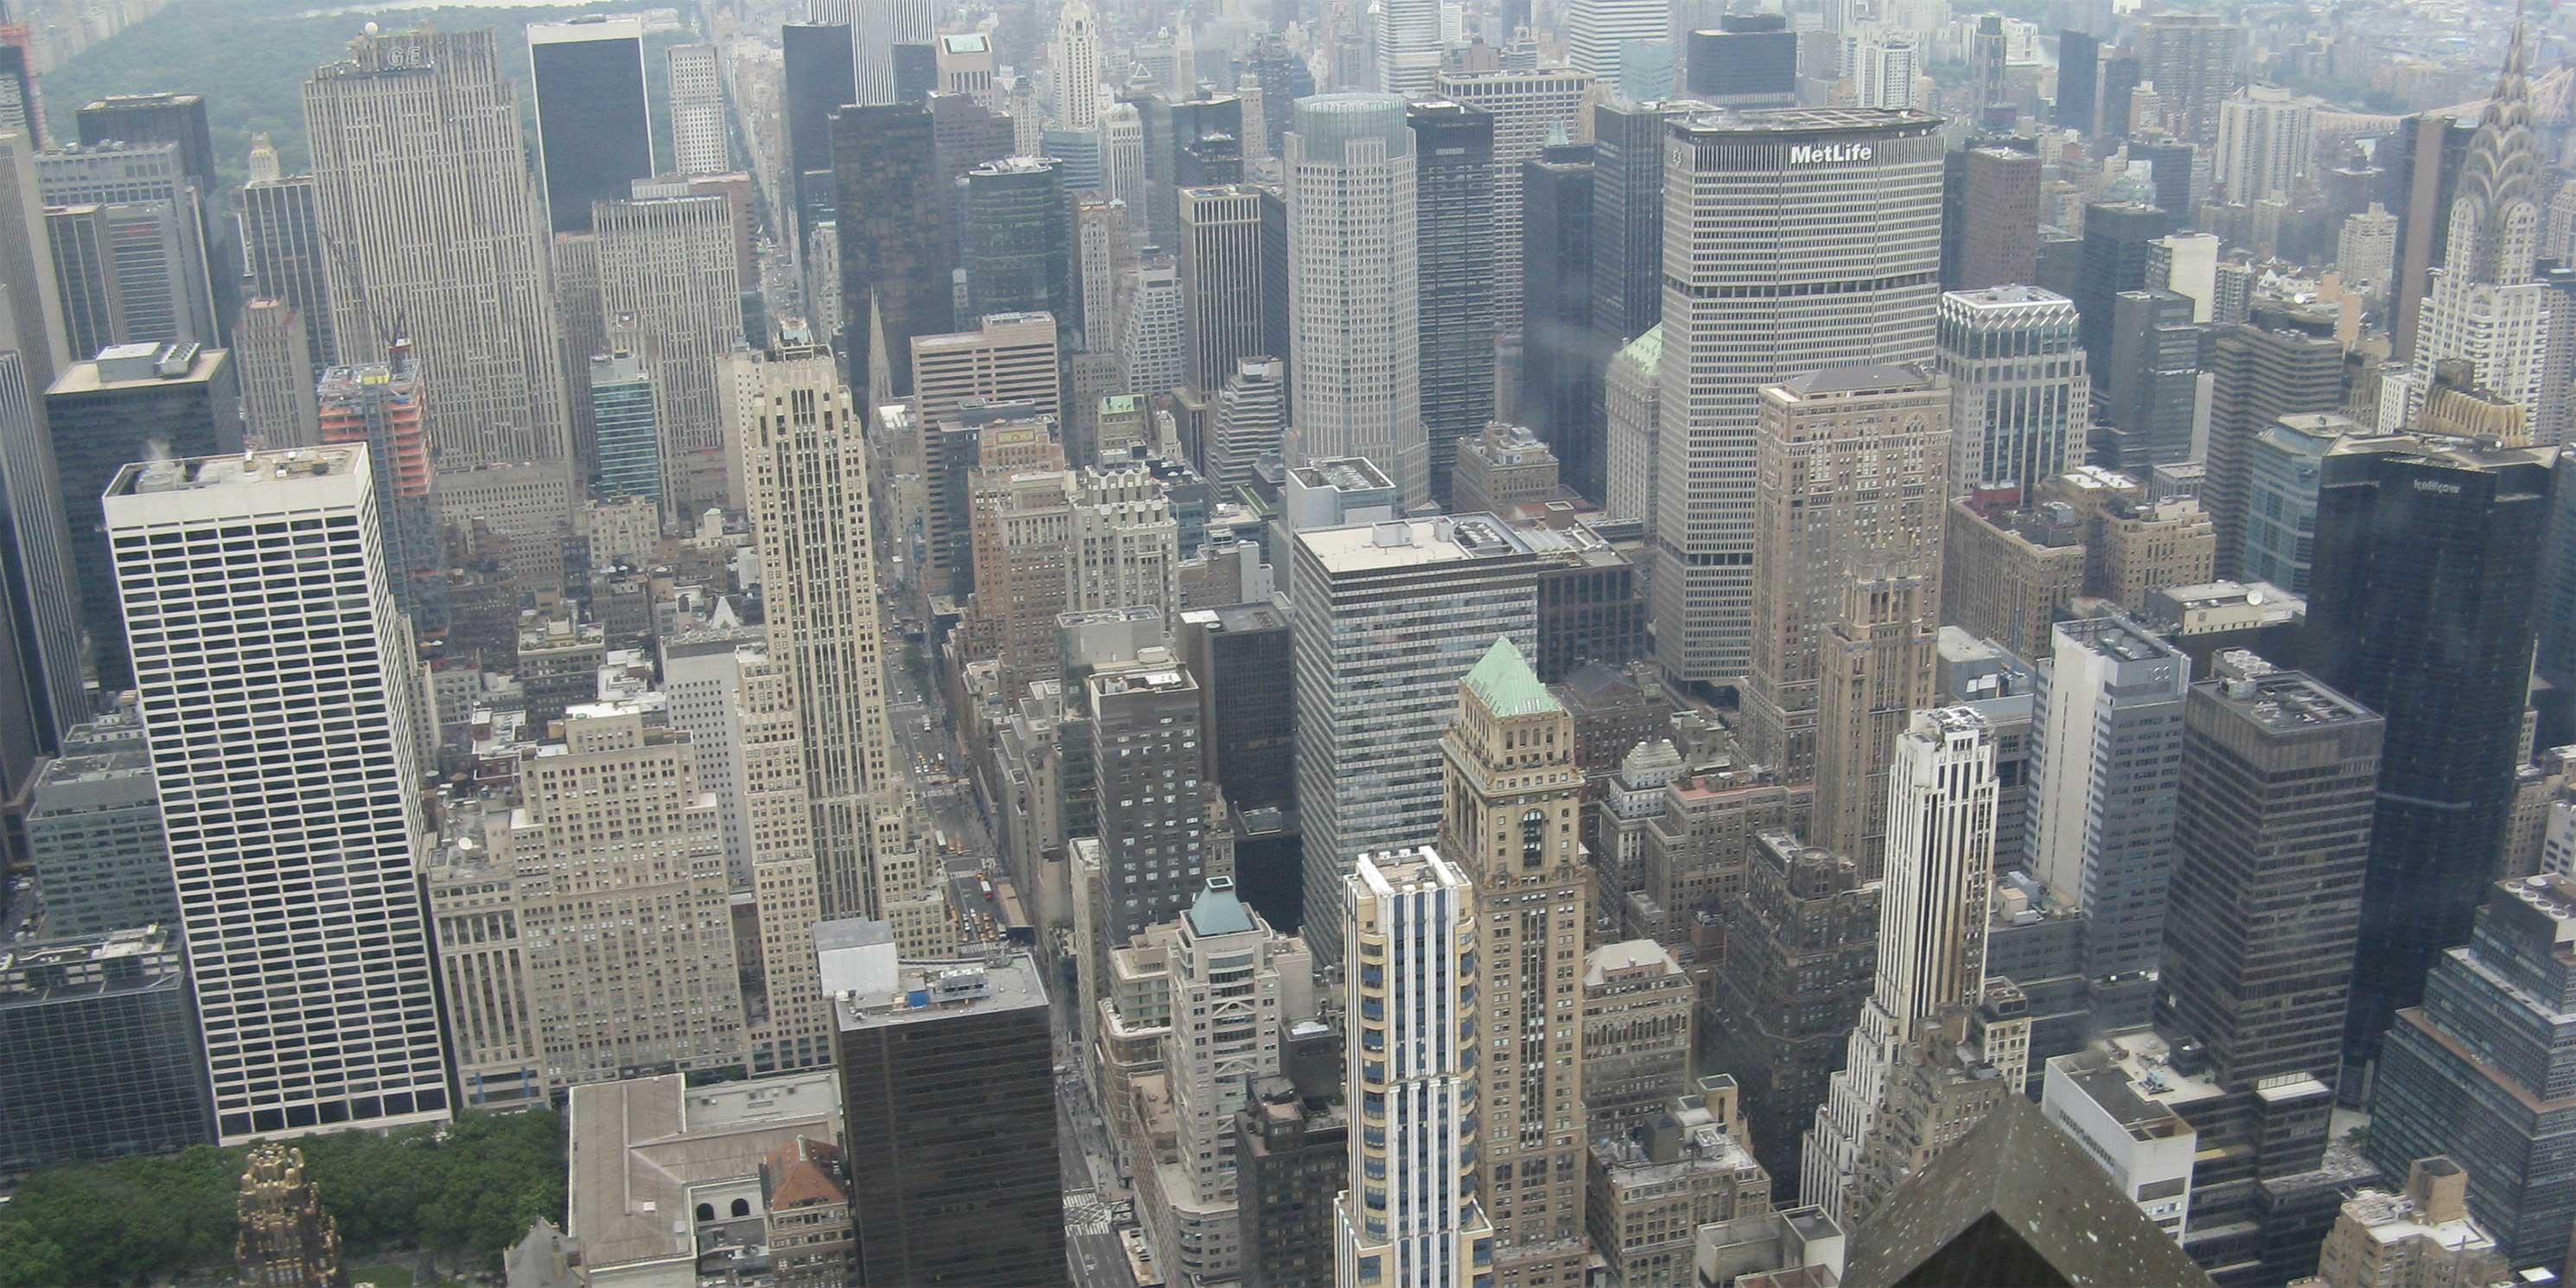 Skyscrapers in Midtown Manhattan. Photo: Wikimedia Commons, Yair Haklai.